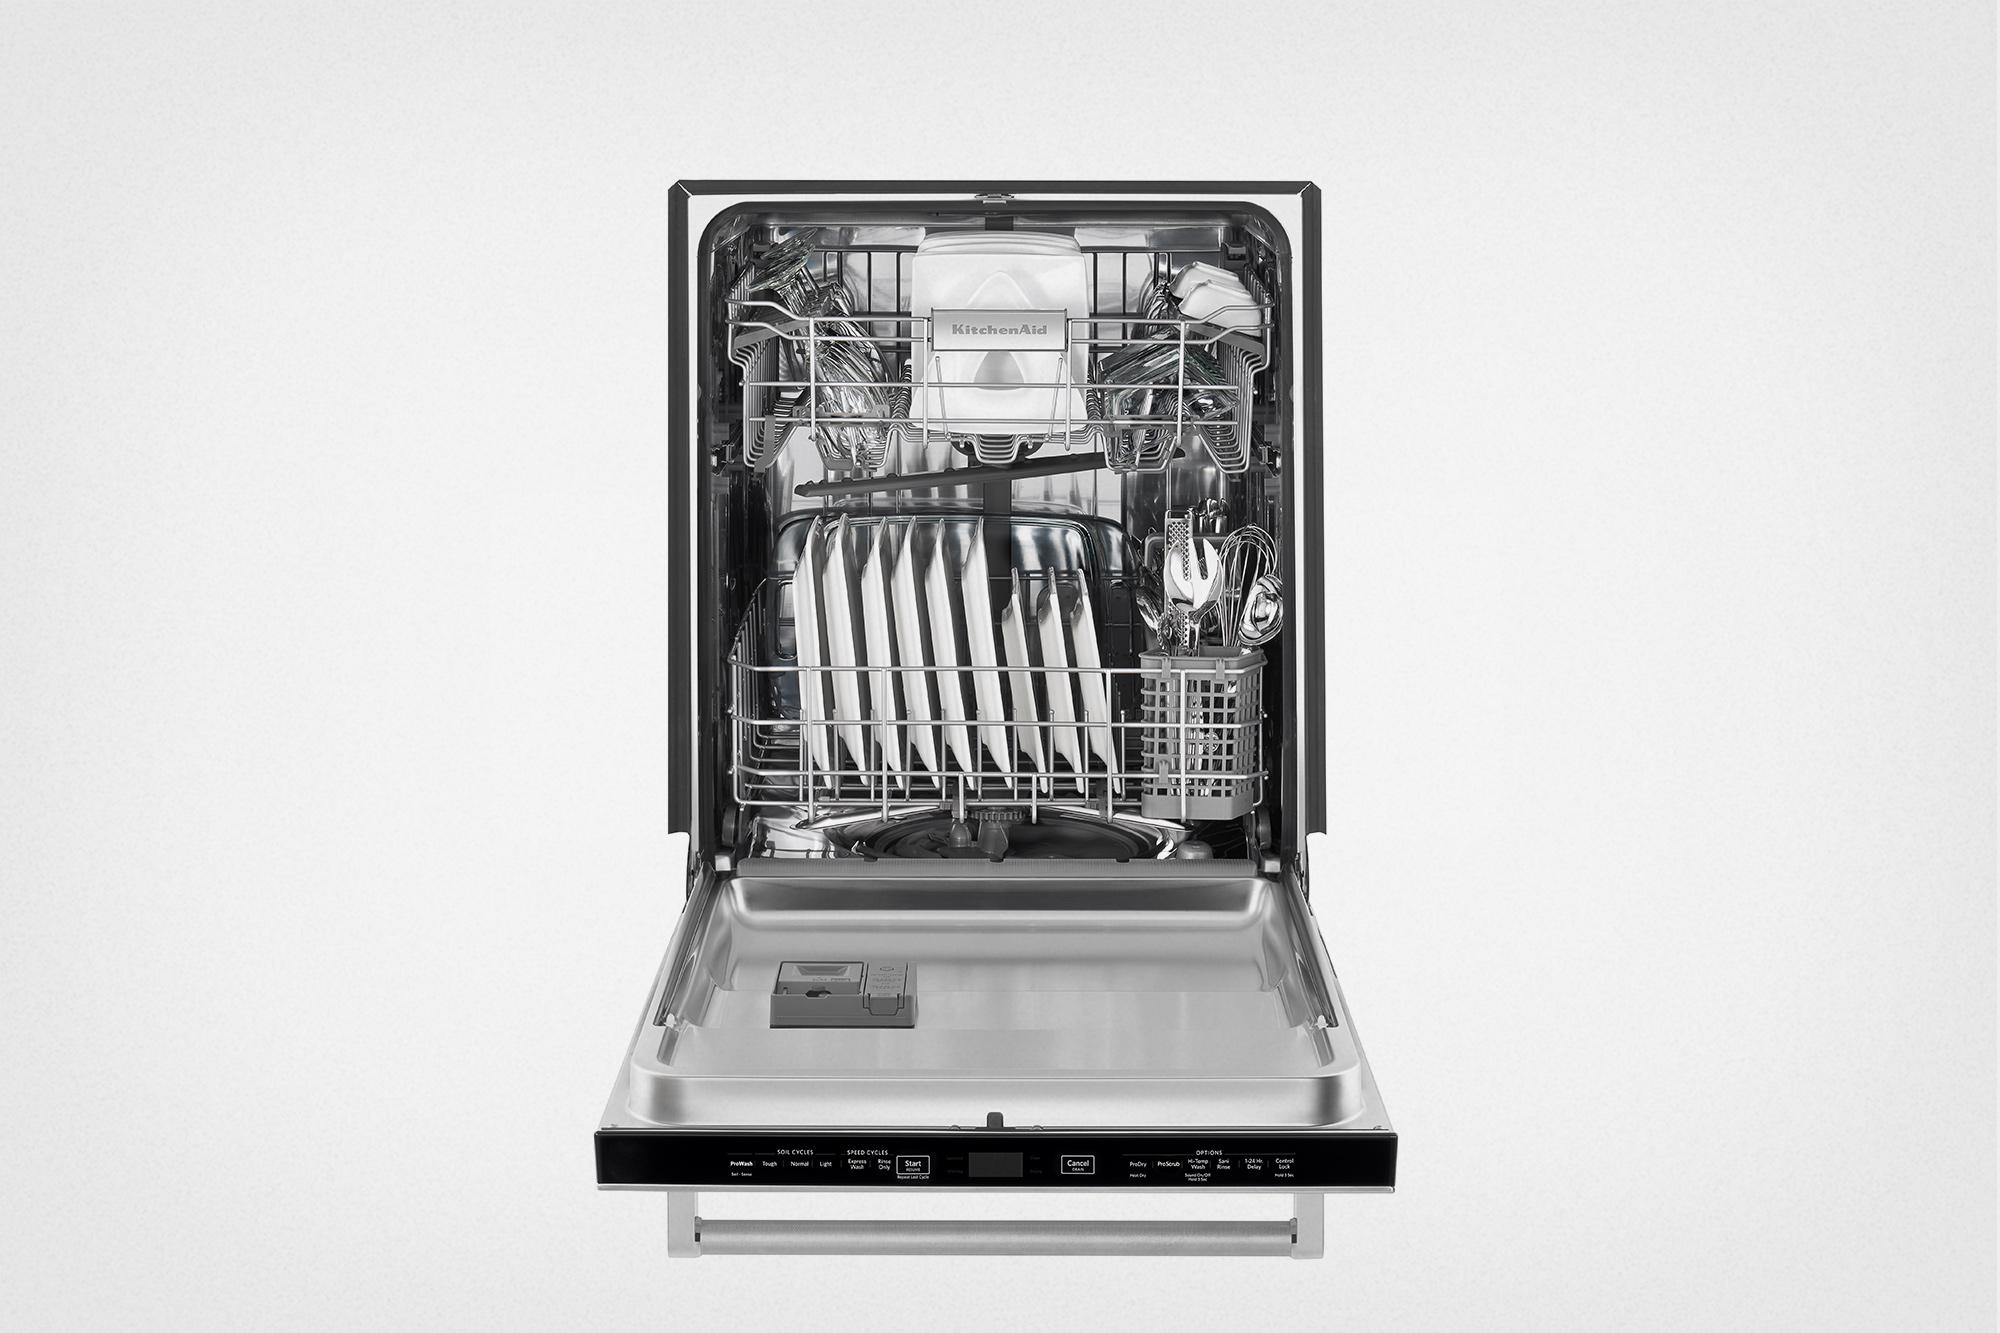 The best dishwasher  S Built In Kitchenaid Dishwasher on